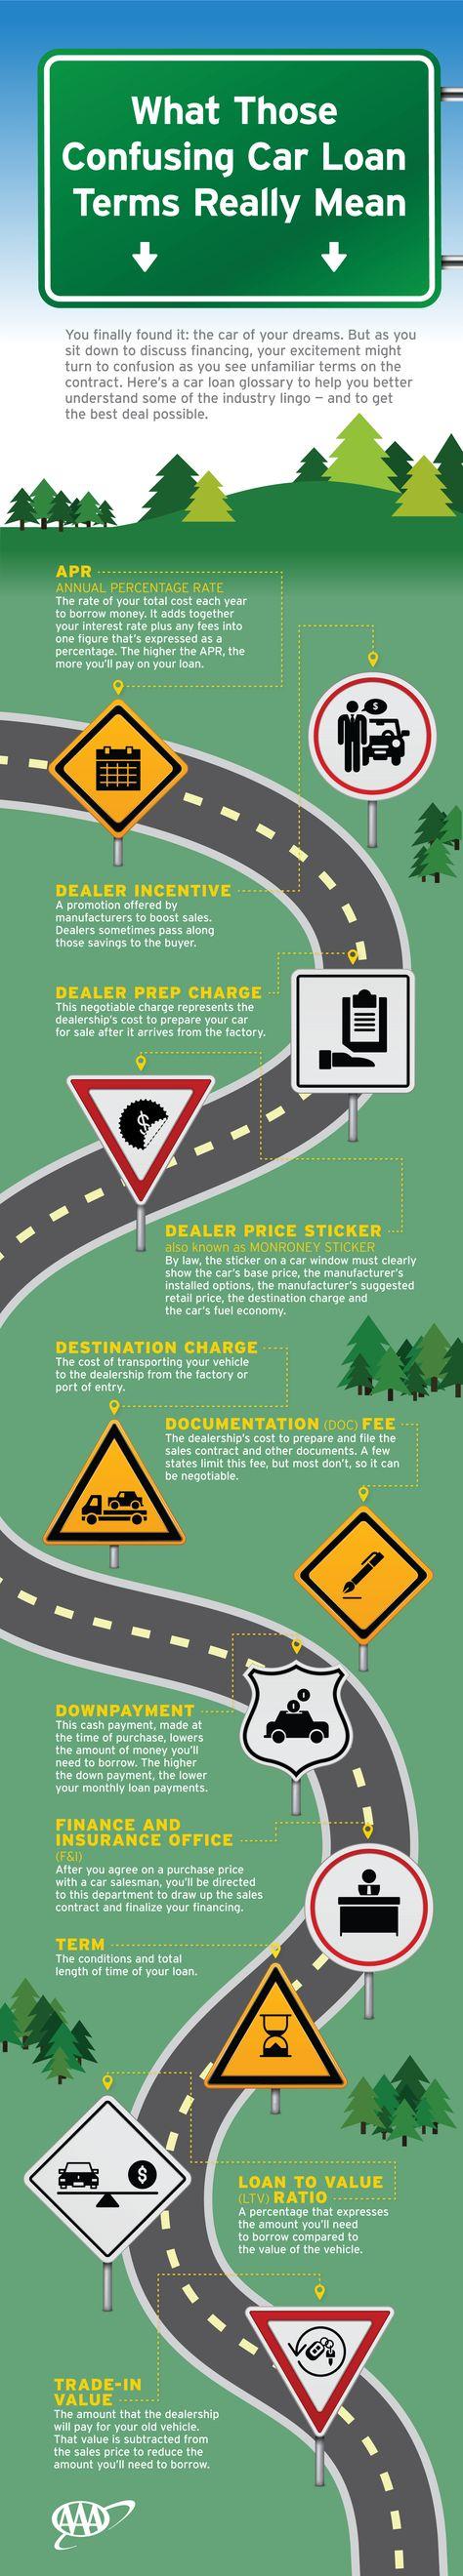 Aaa Car Loans >> Pinterest France